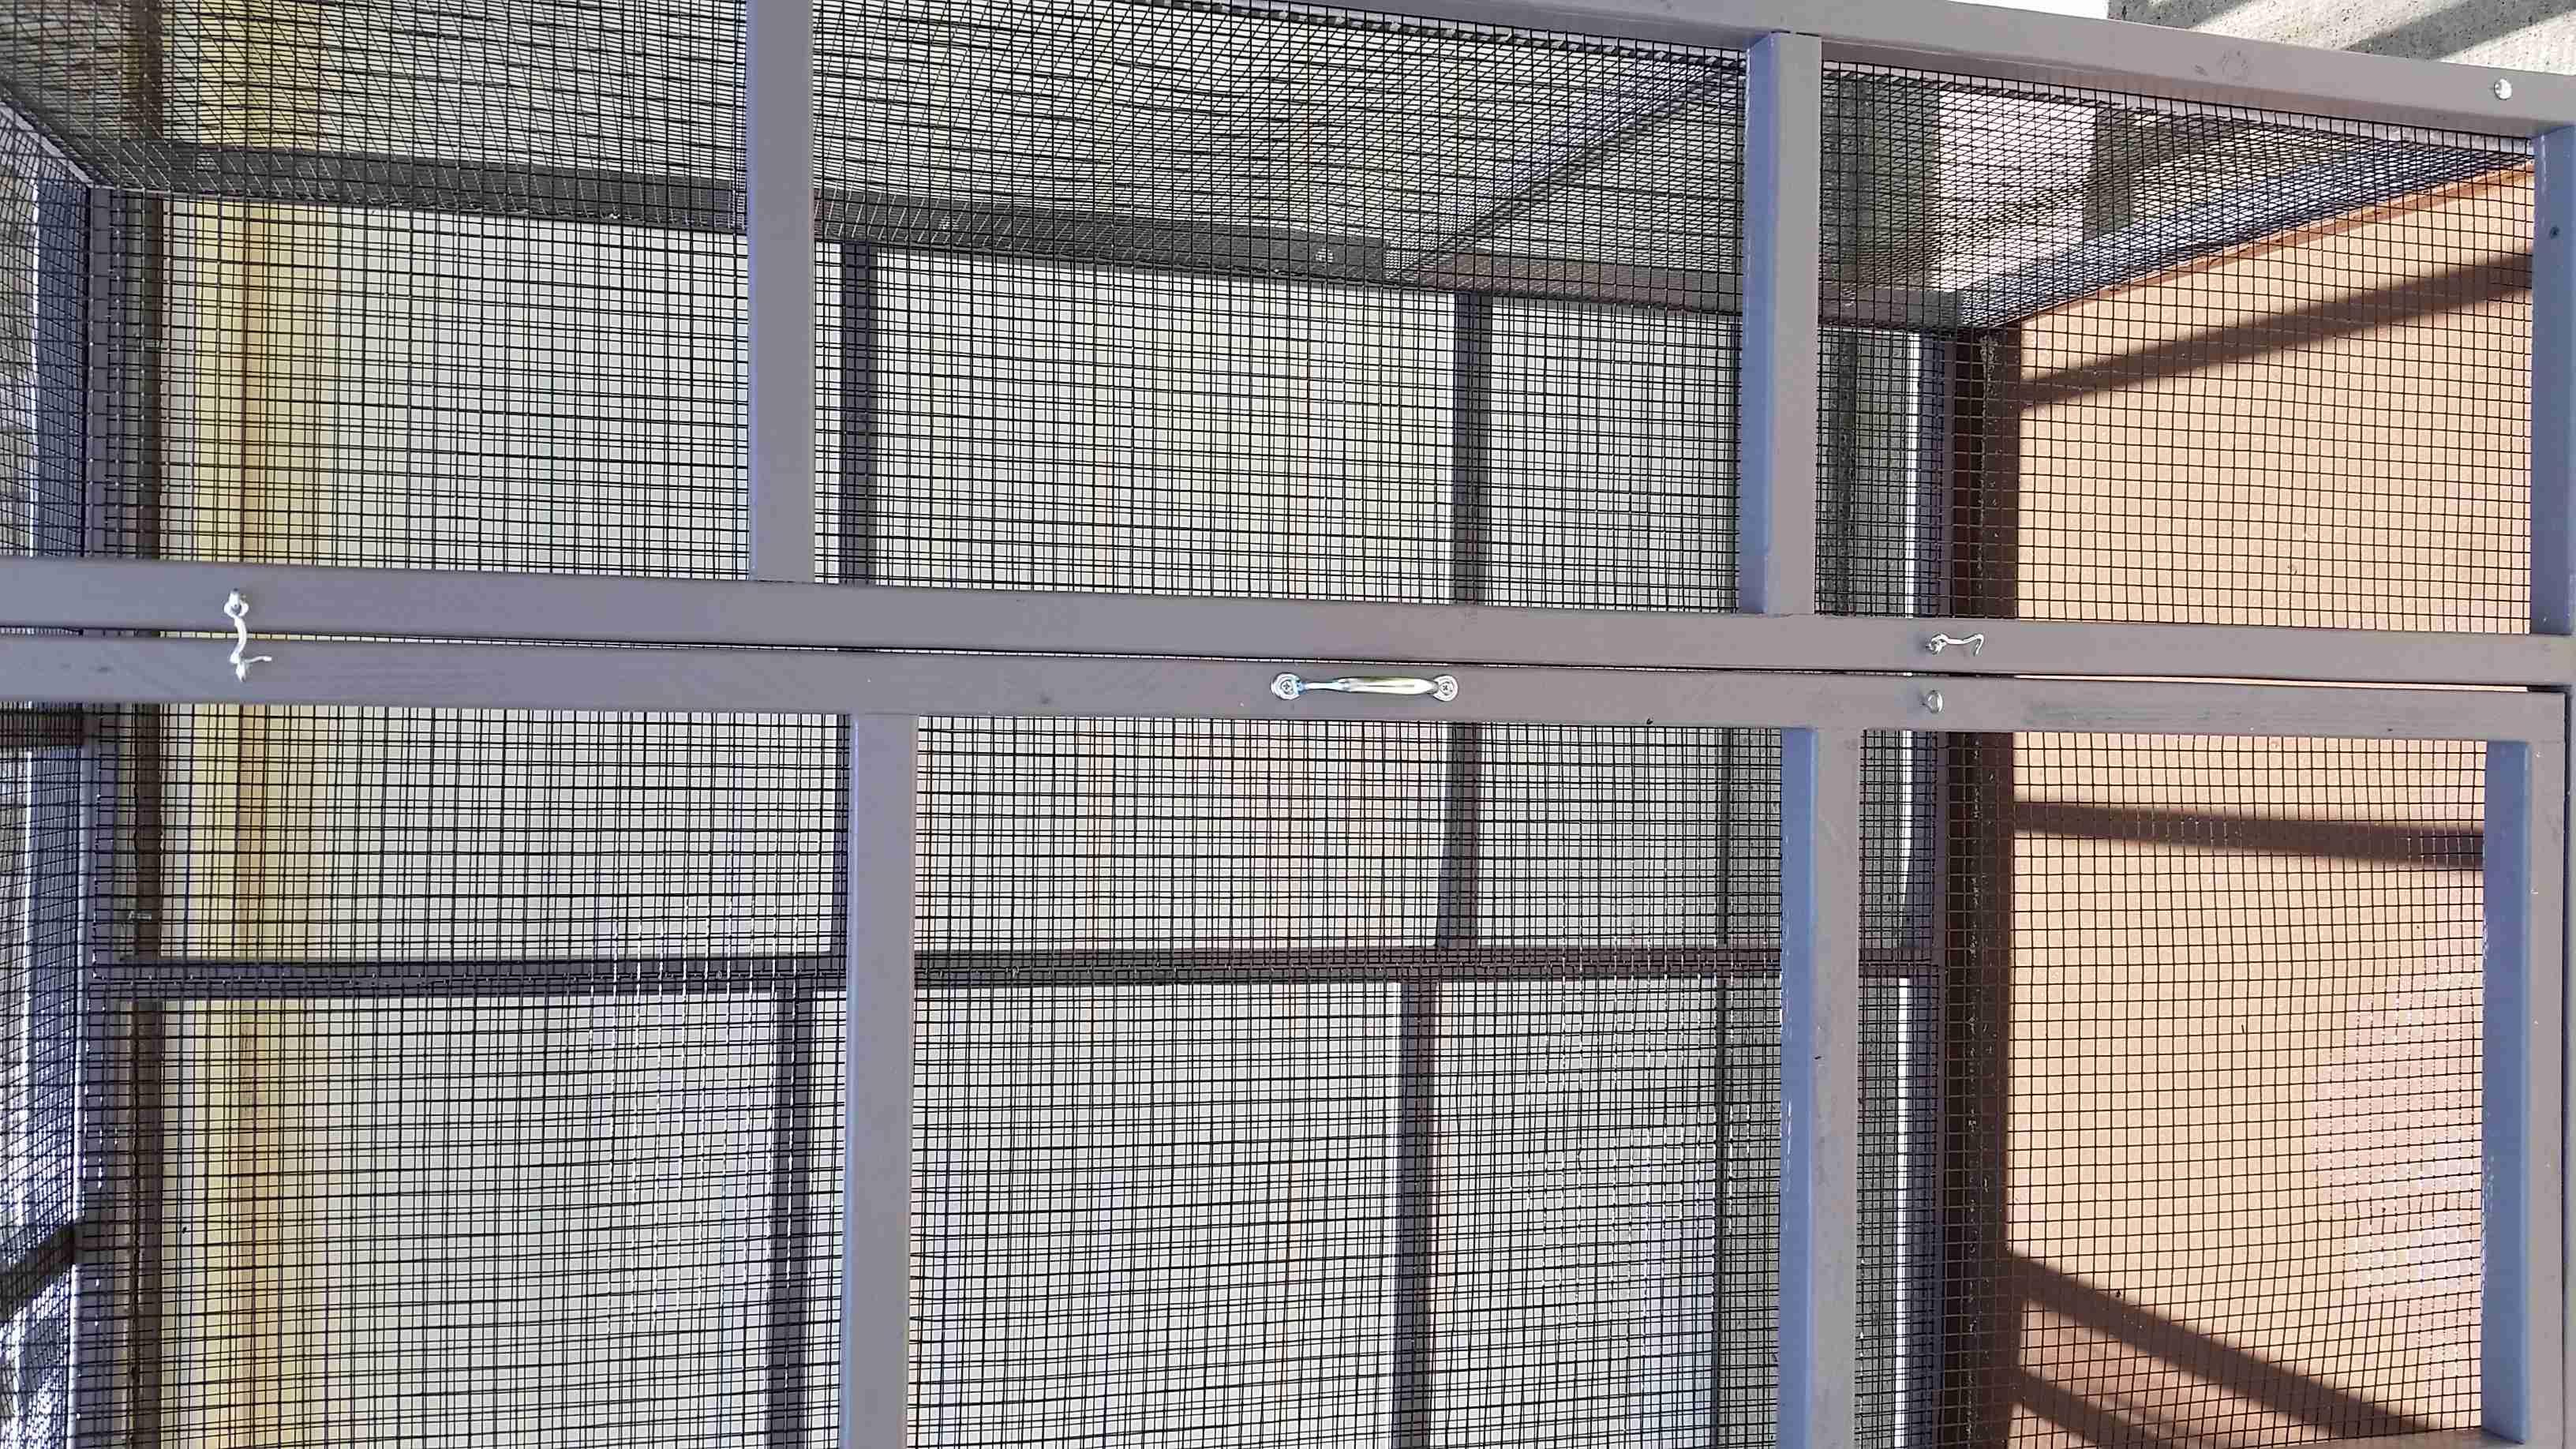 Squirrel - Sugar Glider Cage (12)